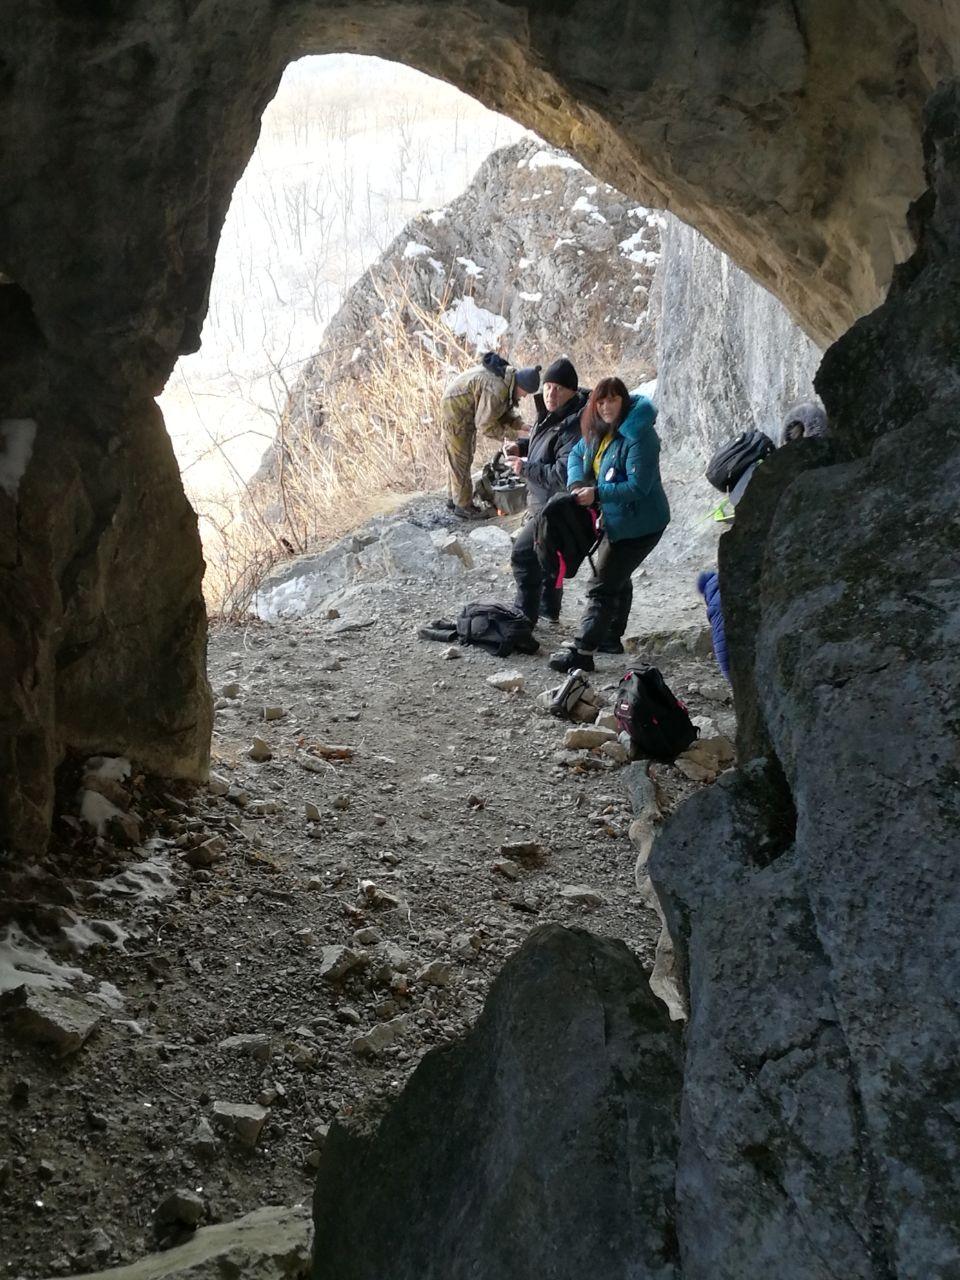 У входа в пещеру Мечта спелеолога  Фото Романа Яфизова